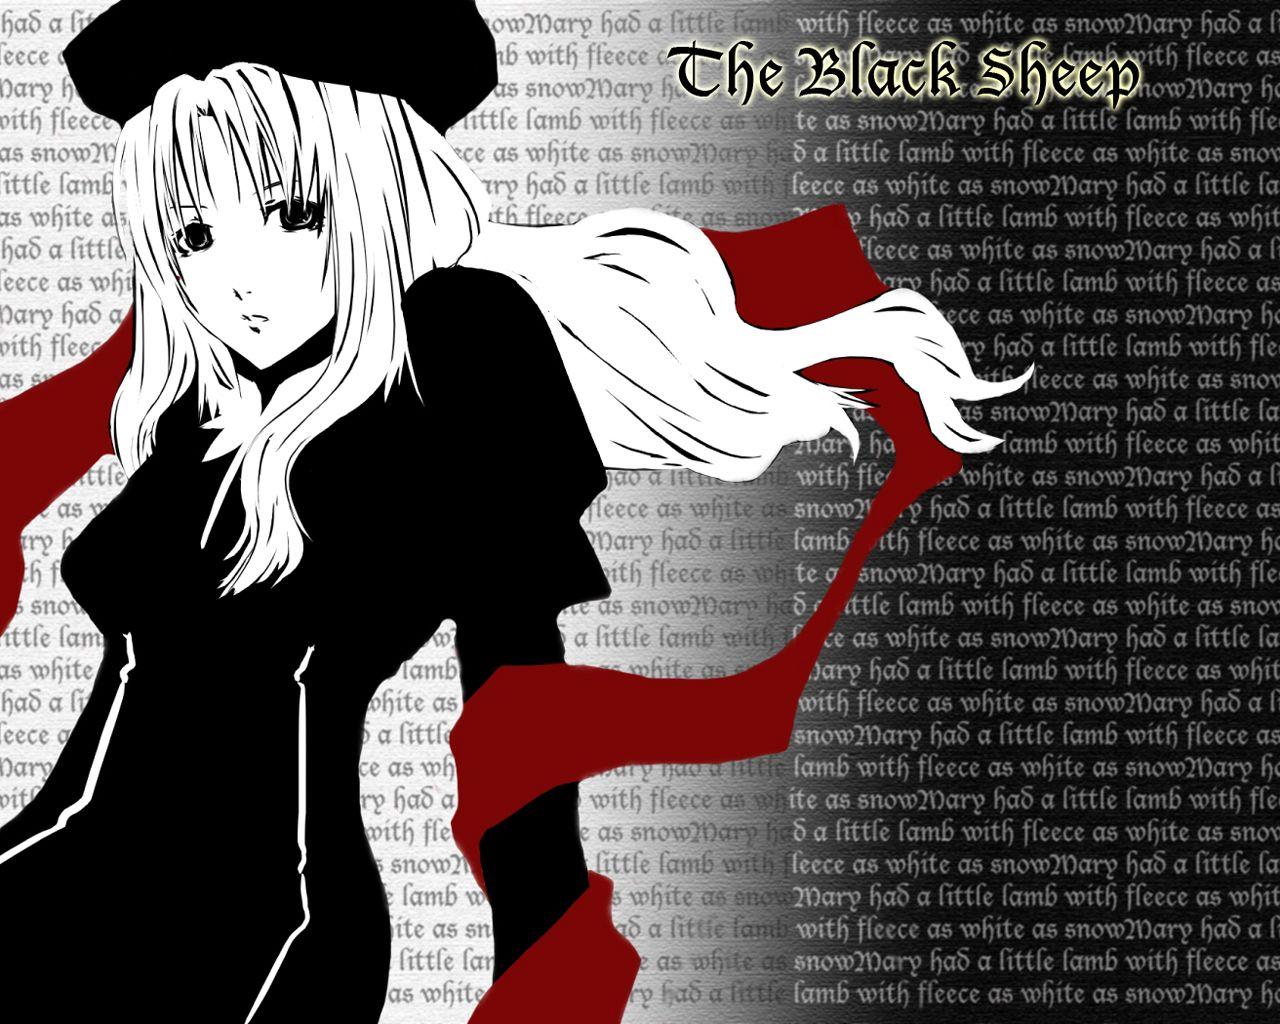 Minitokyo_Fate-Stay_Night_Wallpapers_337843.jpg